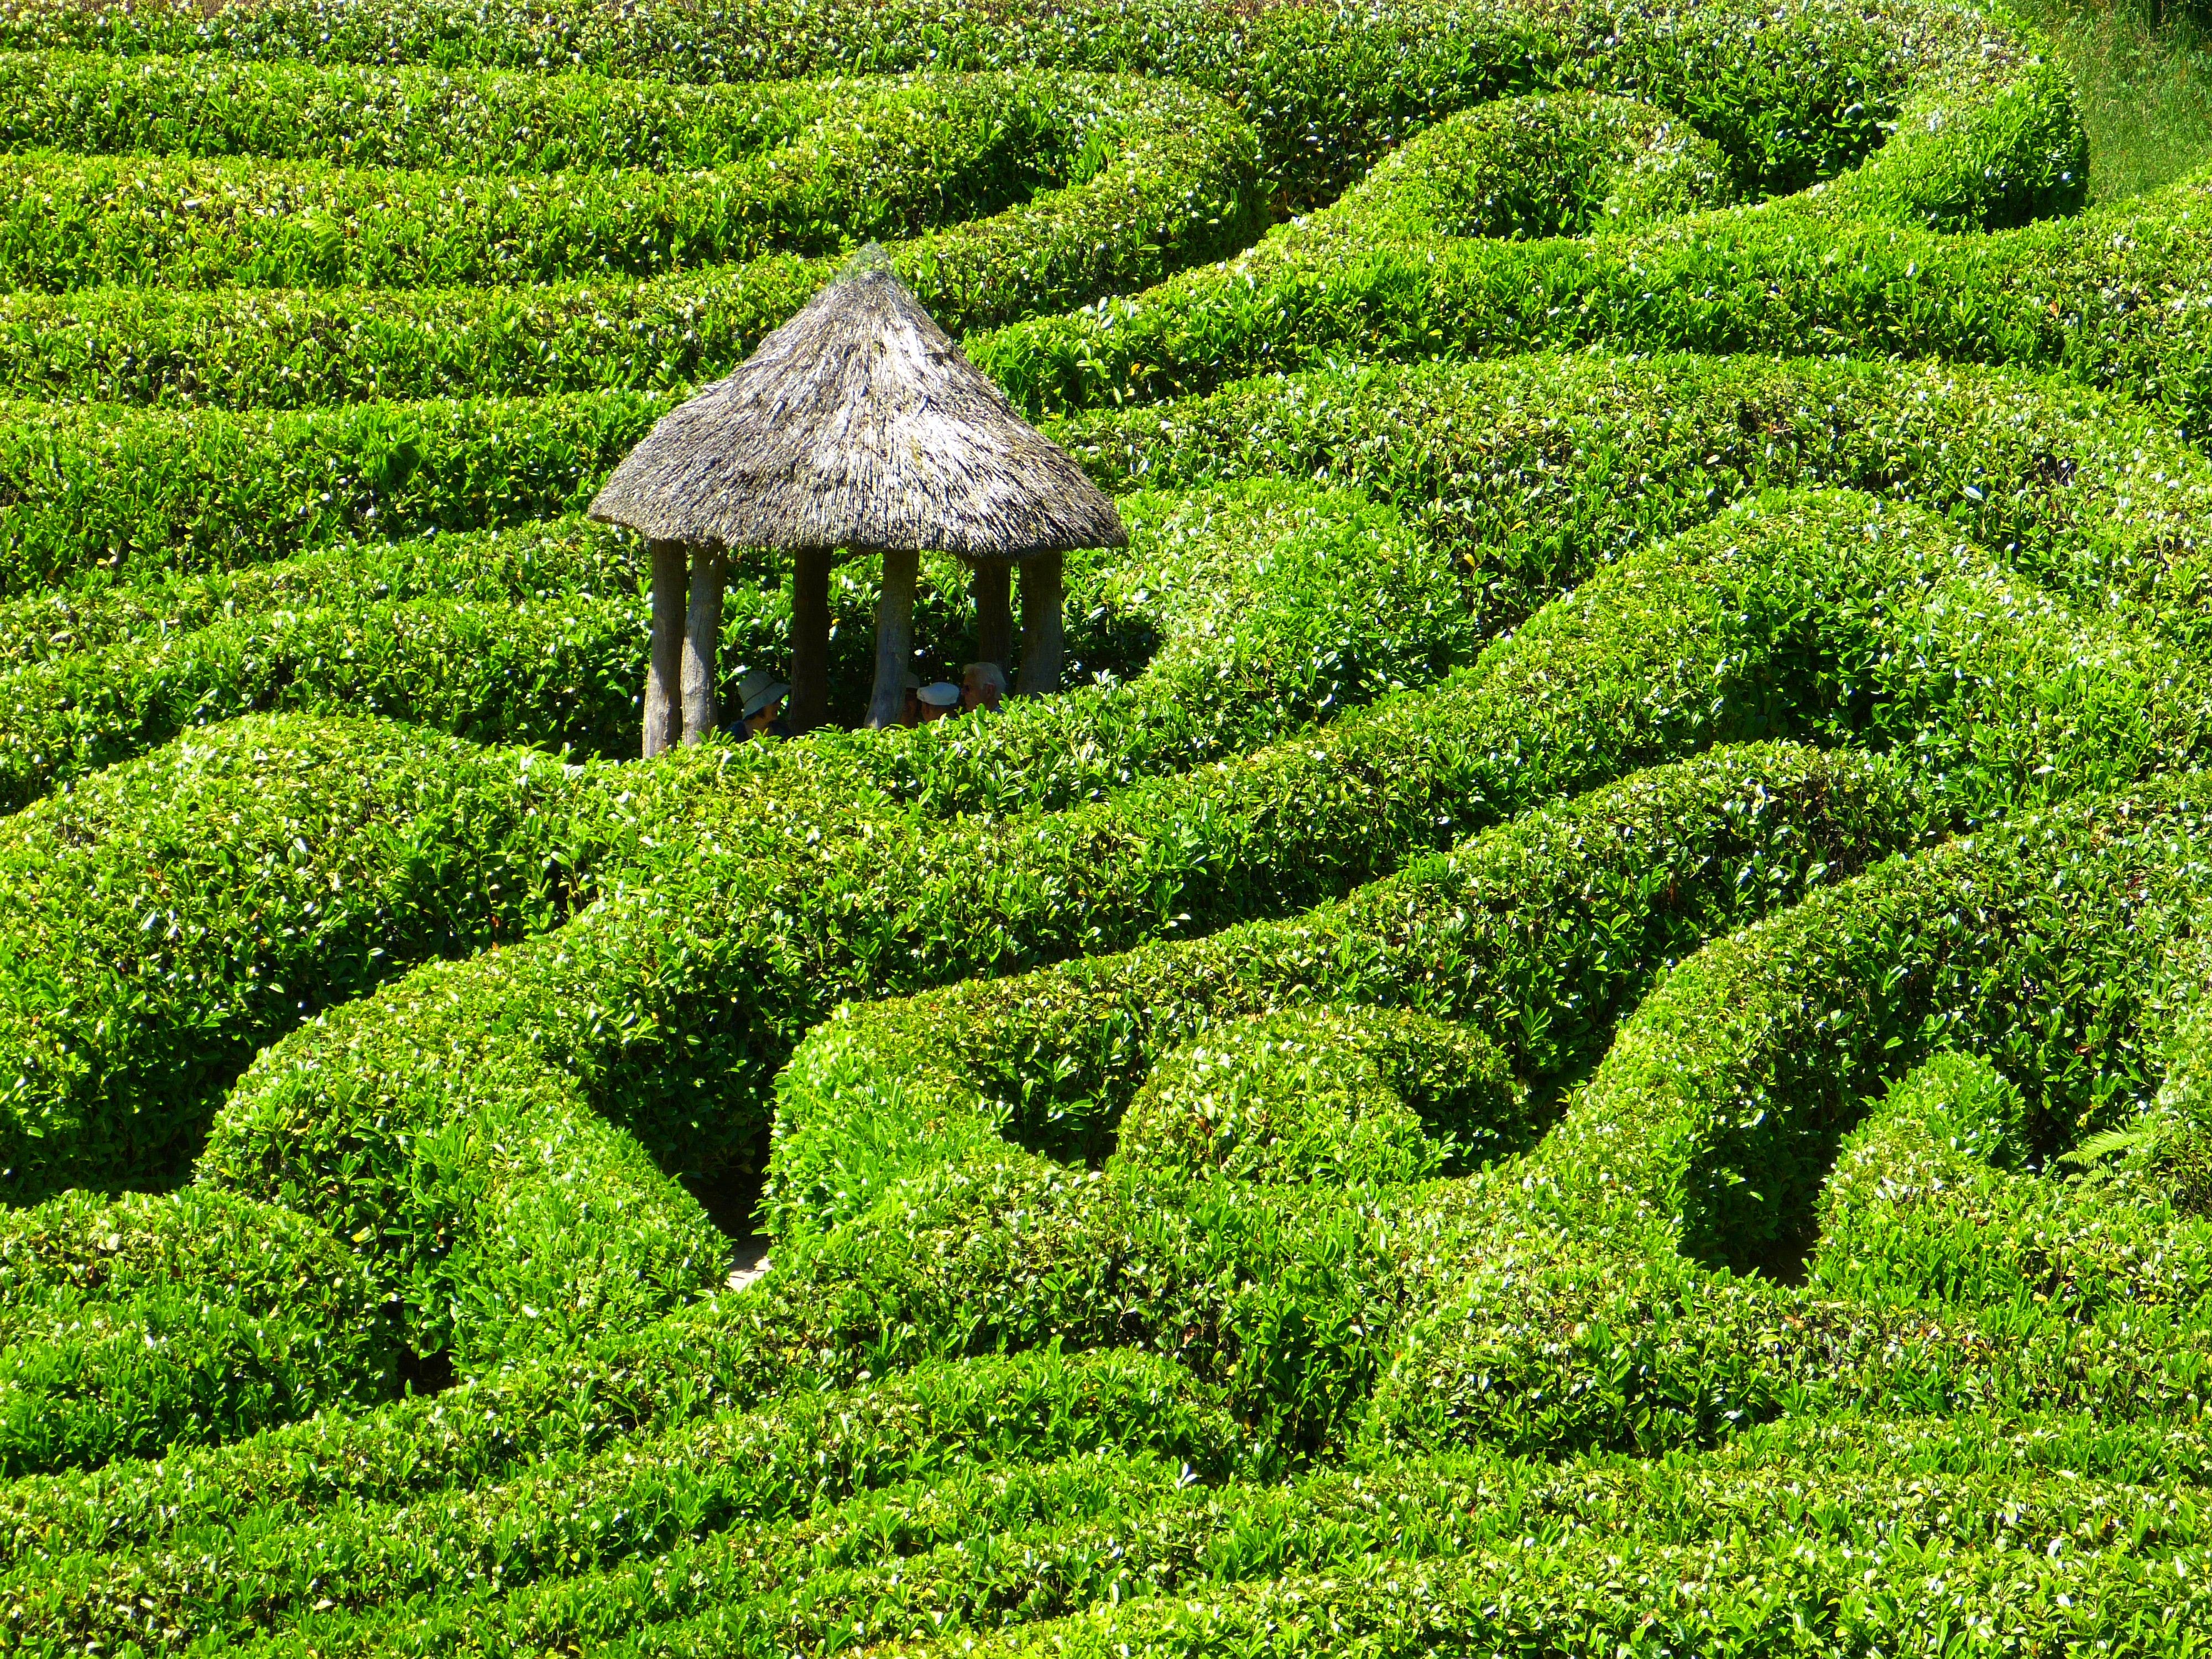 Fotos gratis rbol planta campo c sped flor verde bot nica agricultura jard n Jardin laberinto